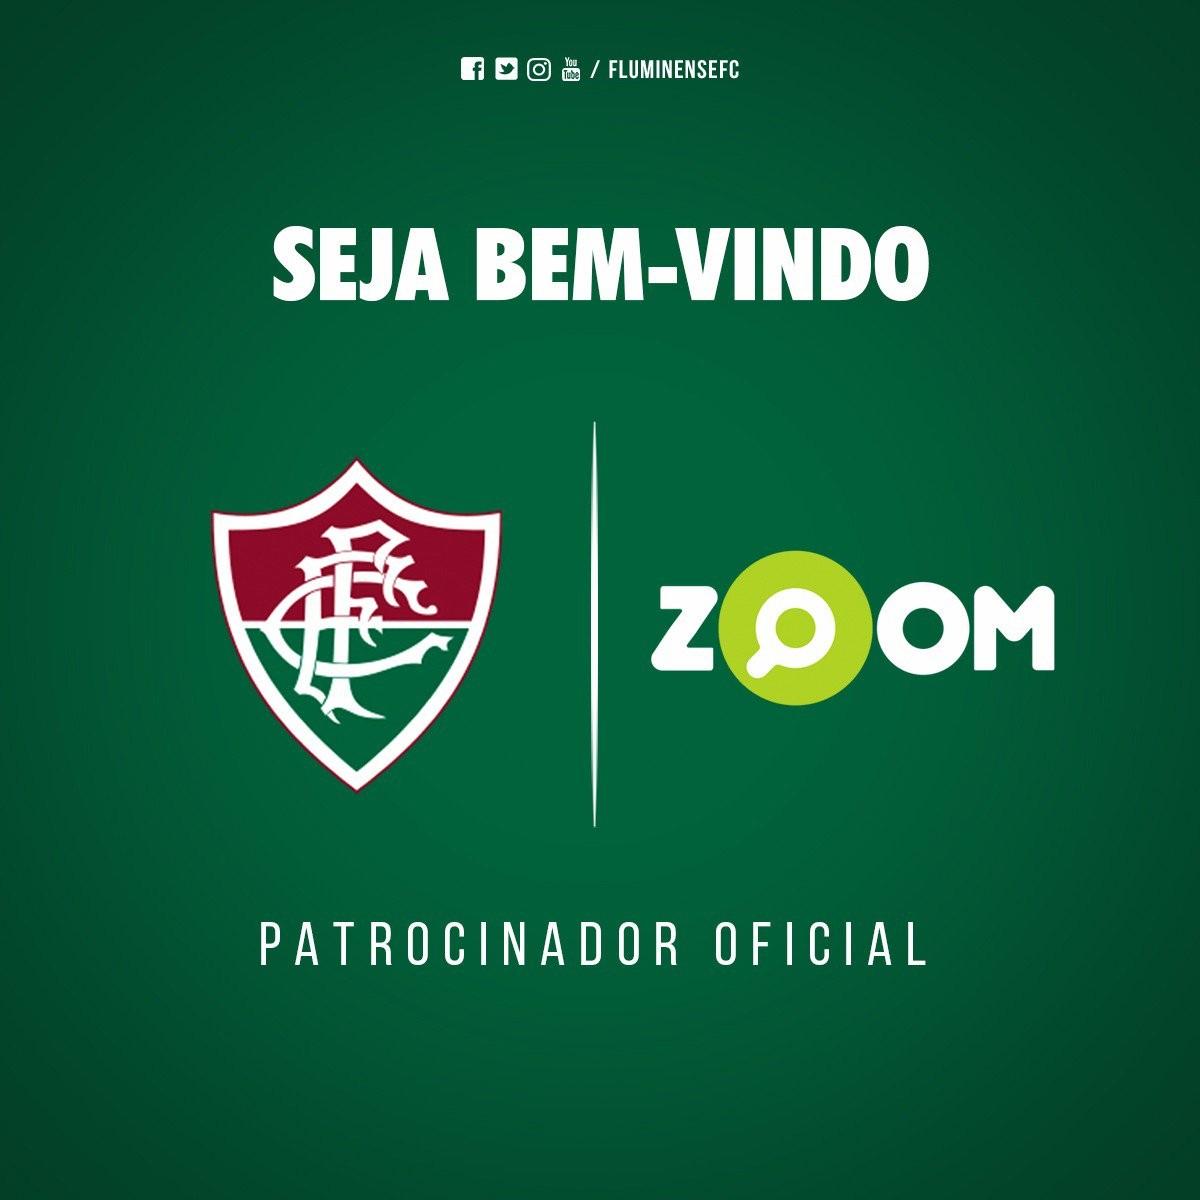 96a8324e66 Fluminense anuncia novo patrocinador  site estampa camisa até fim do ano